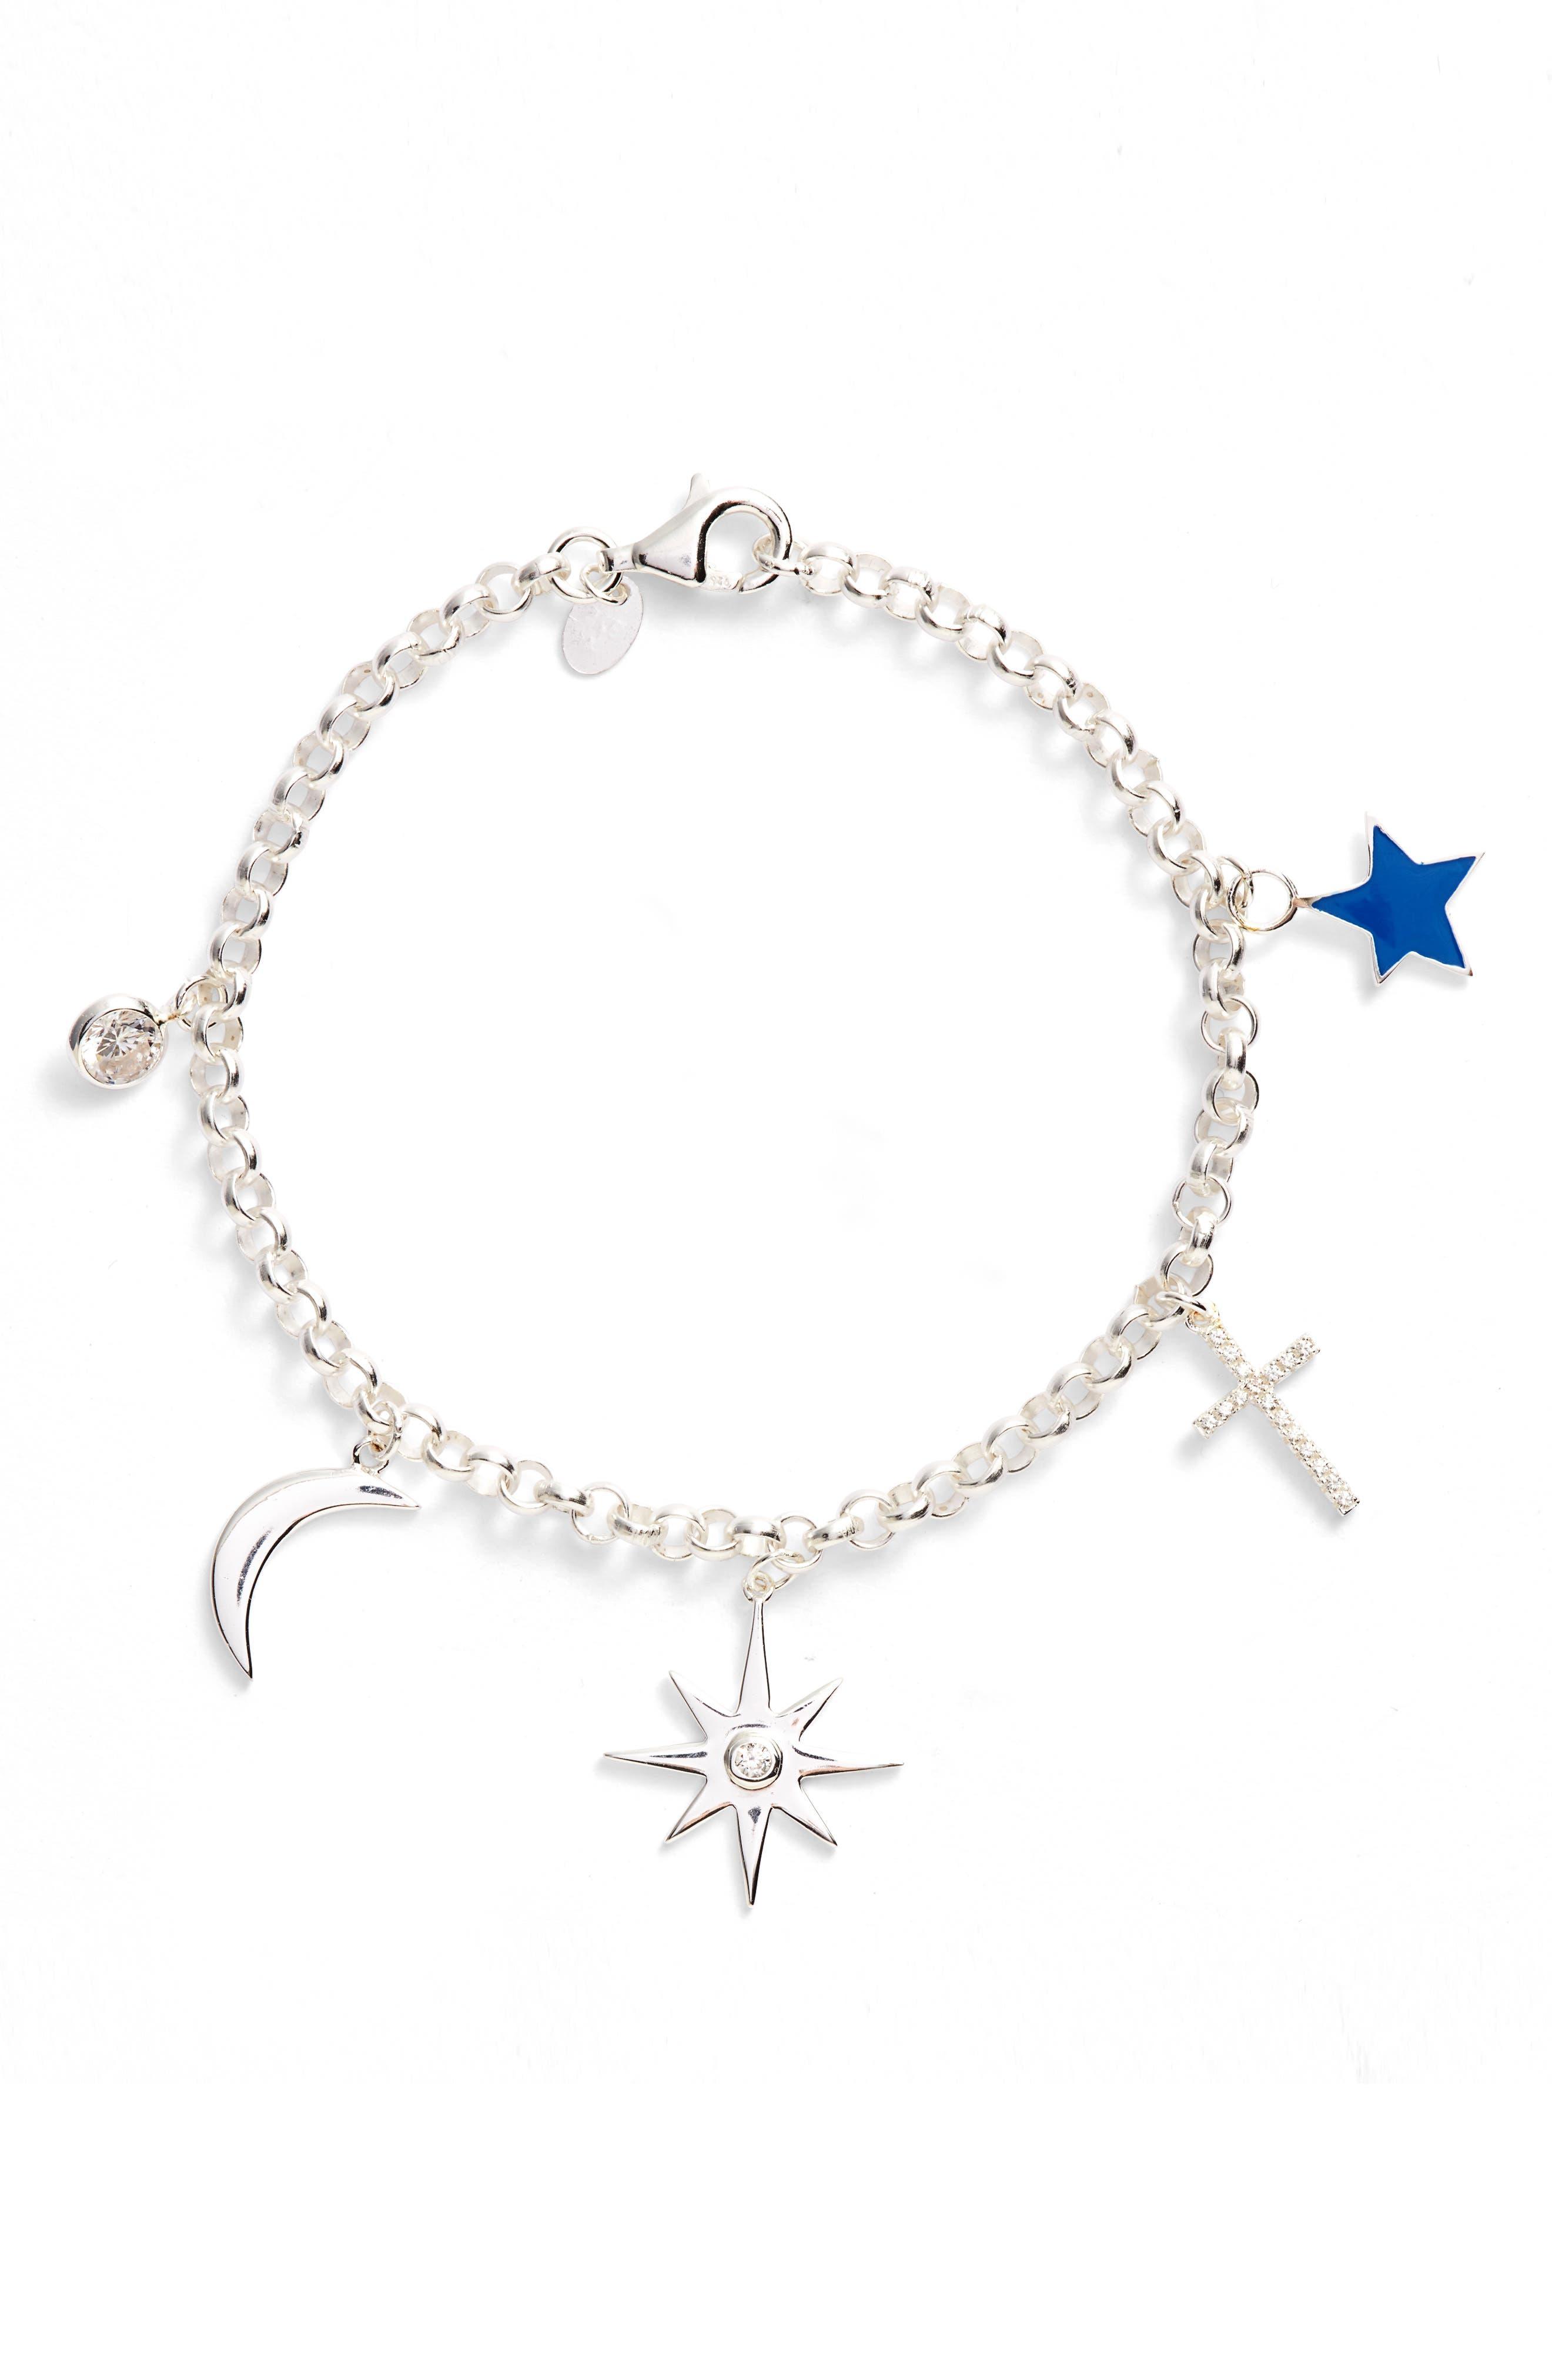 North Star Charm Bracelet,                         Main,                         color,